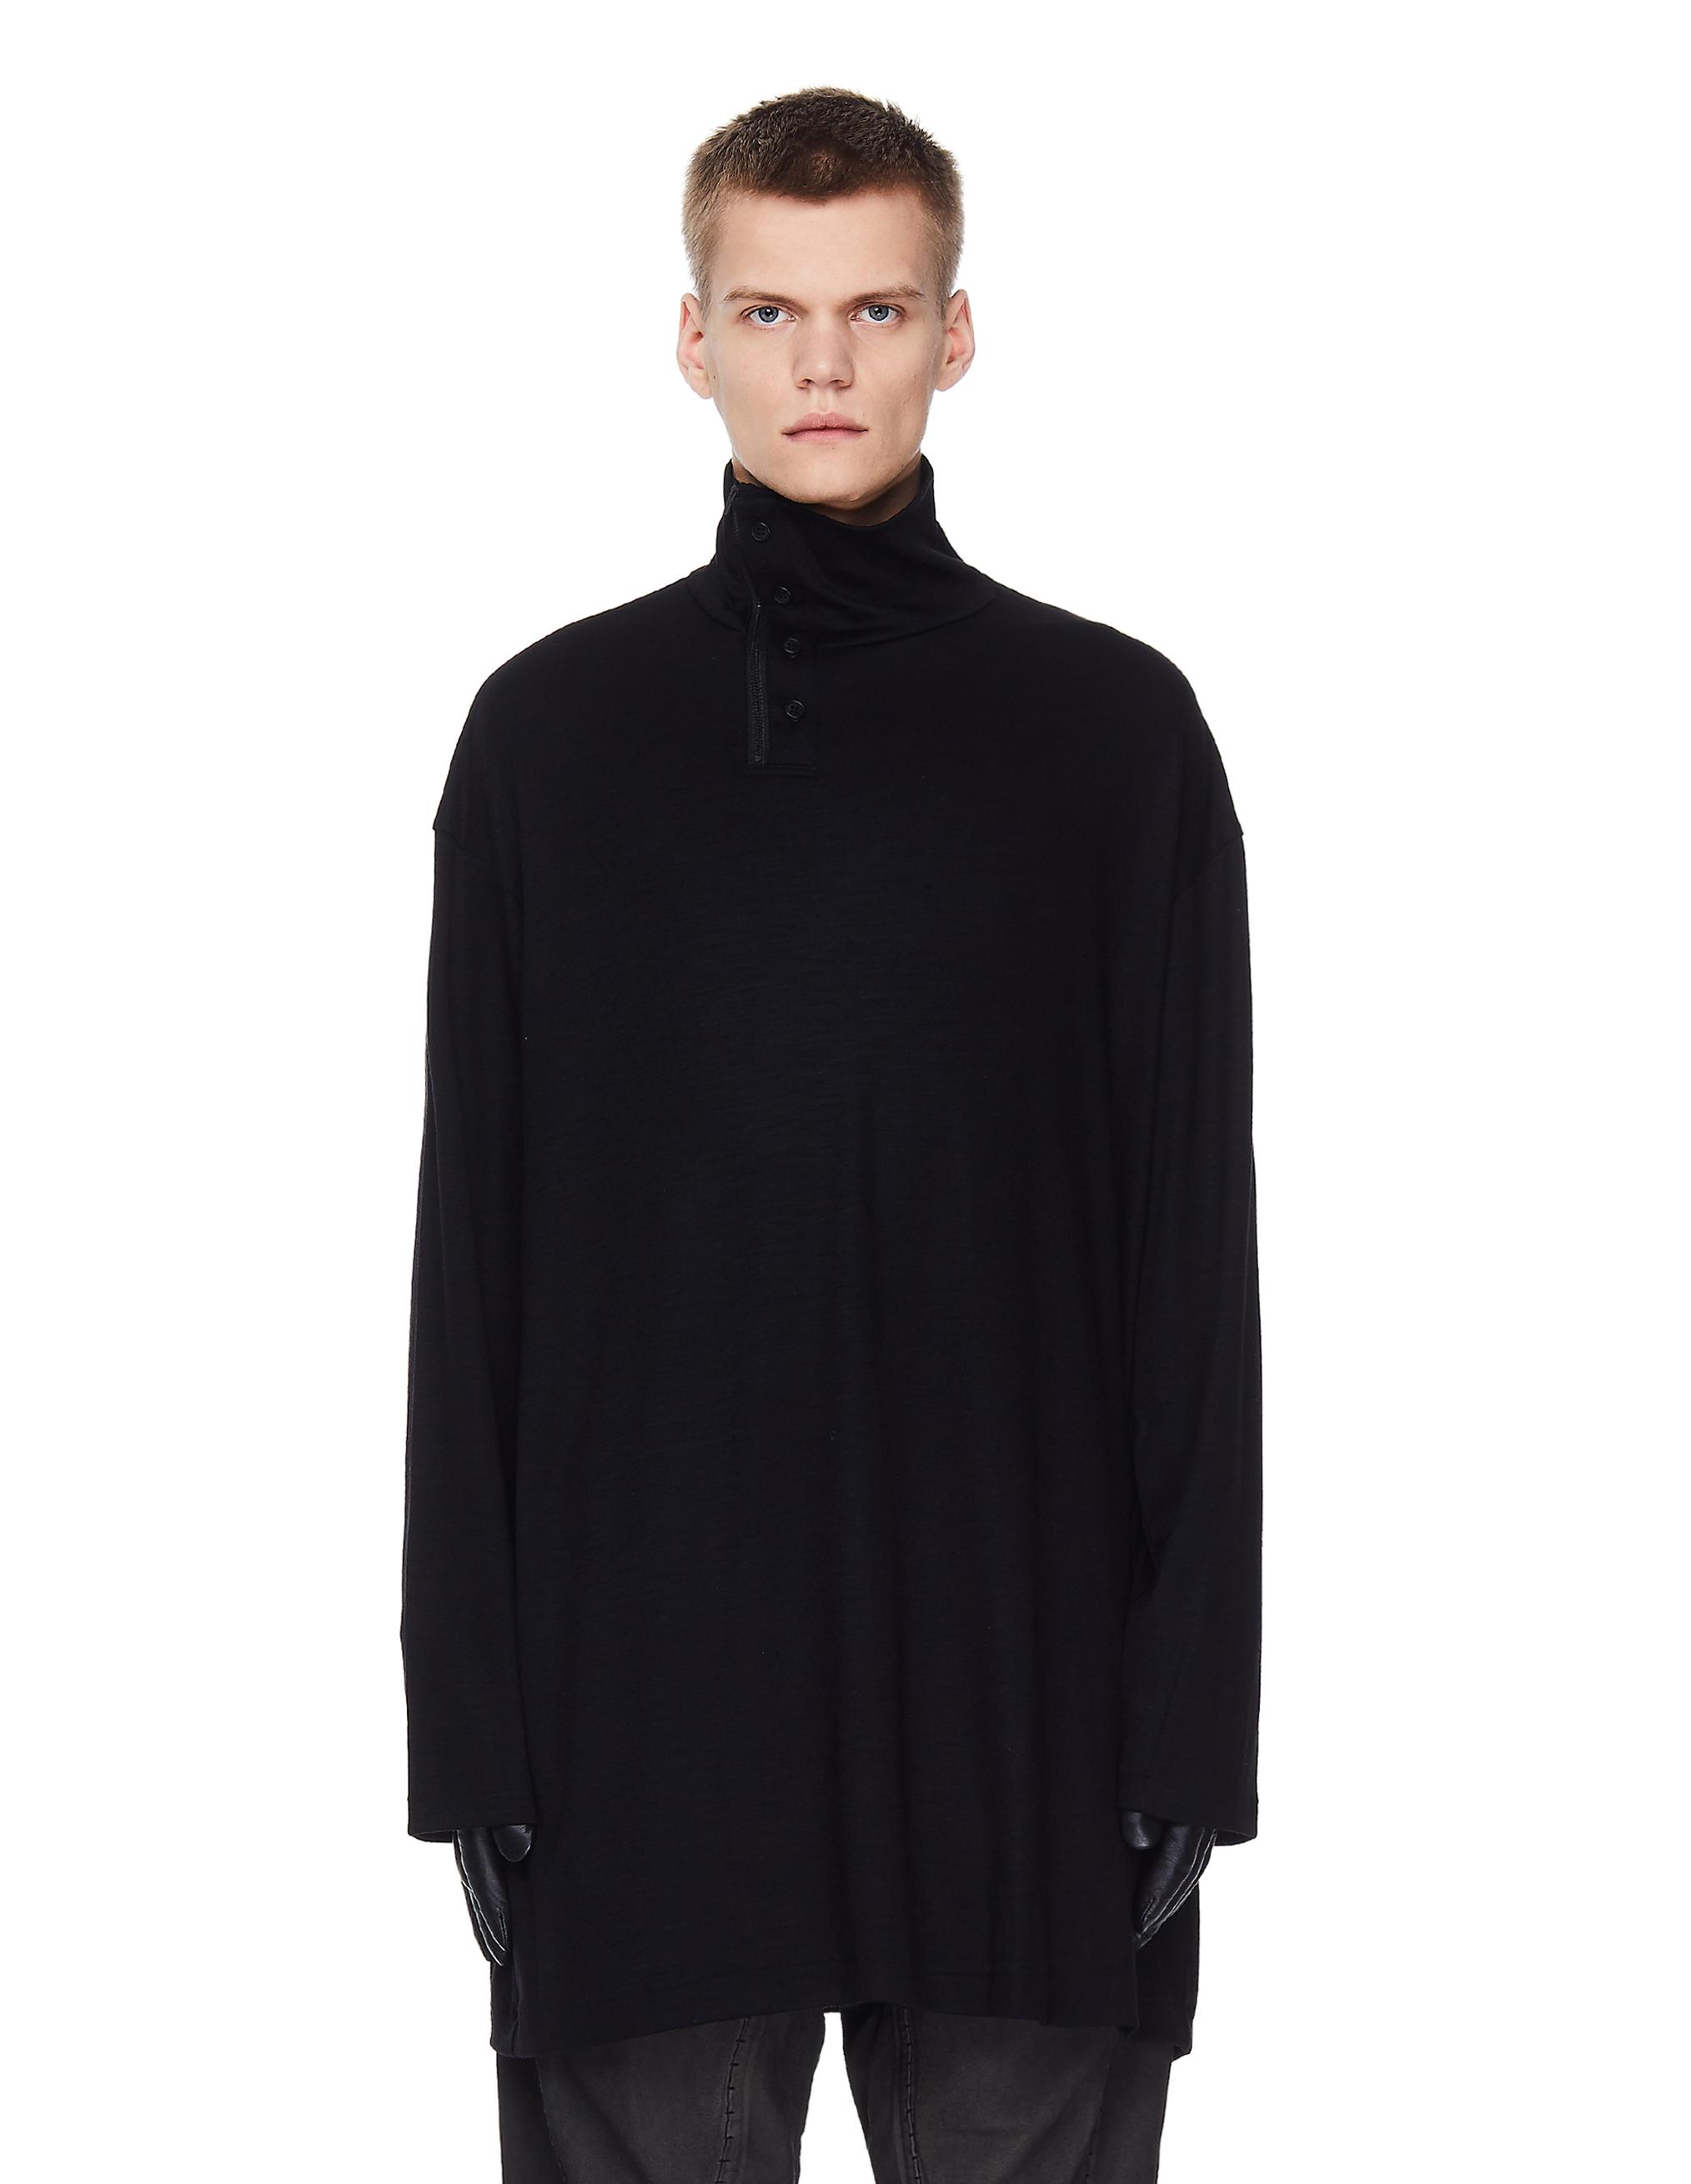 Yohji Yamamoto Black Oversize Turtleneck